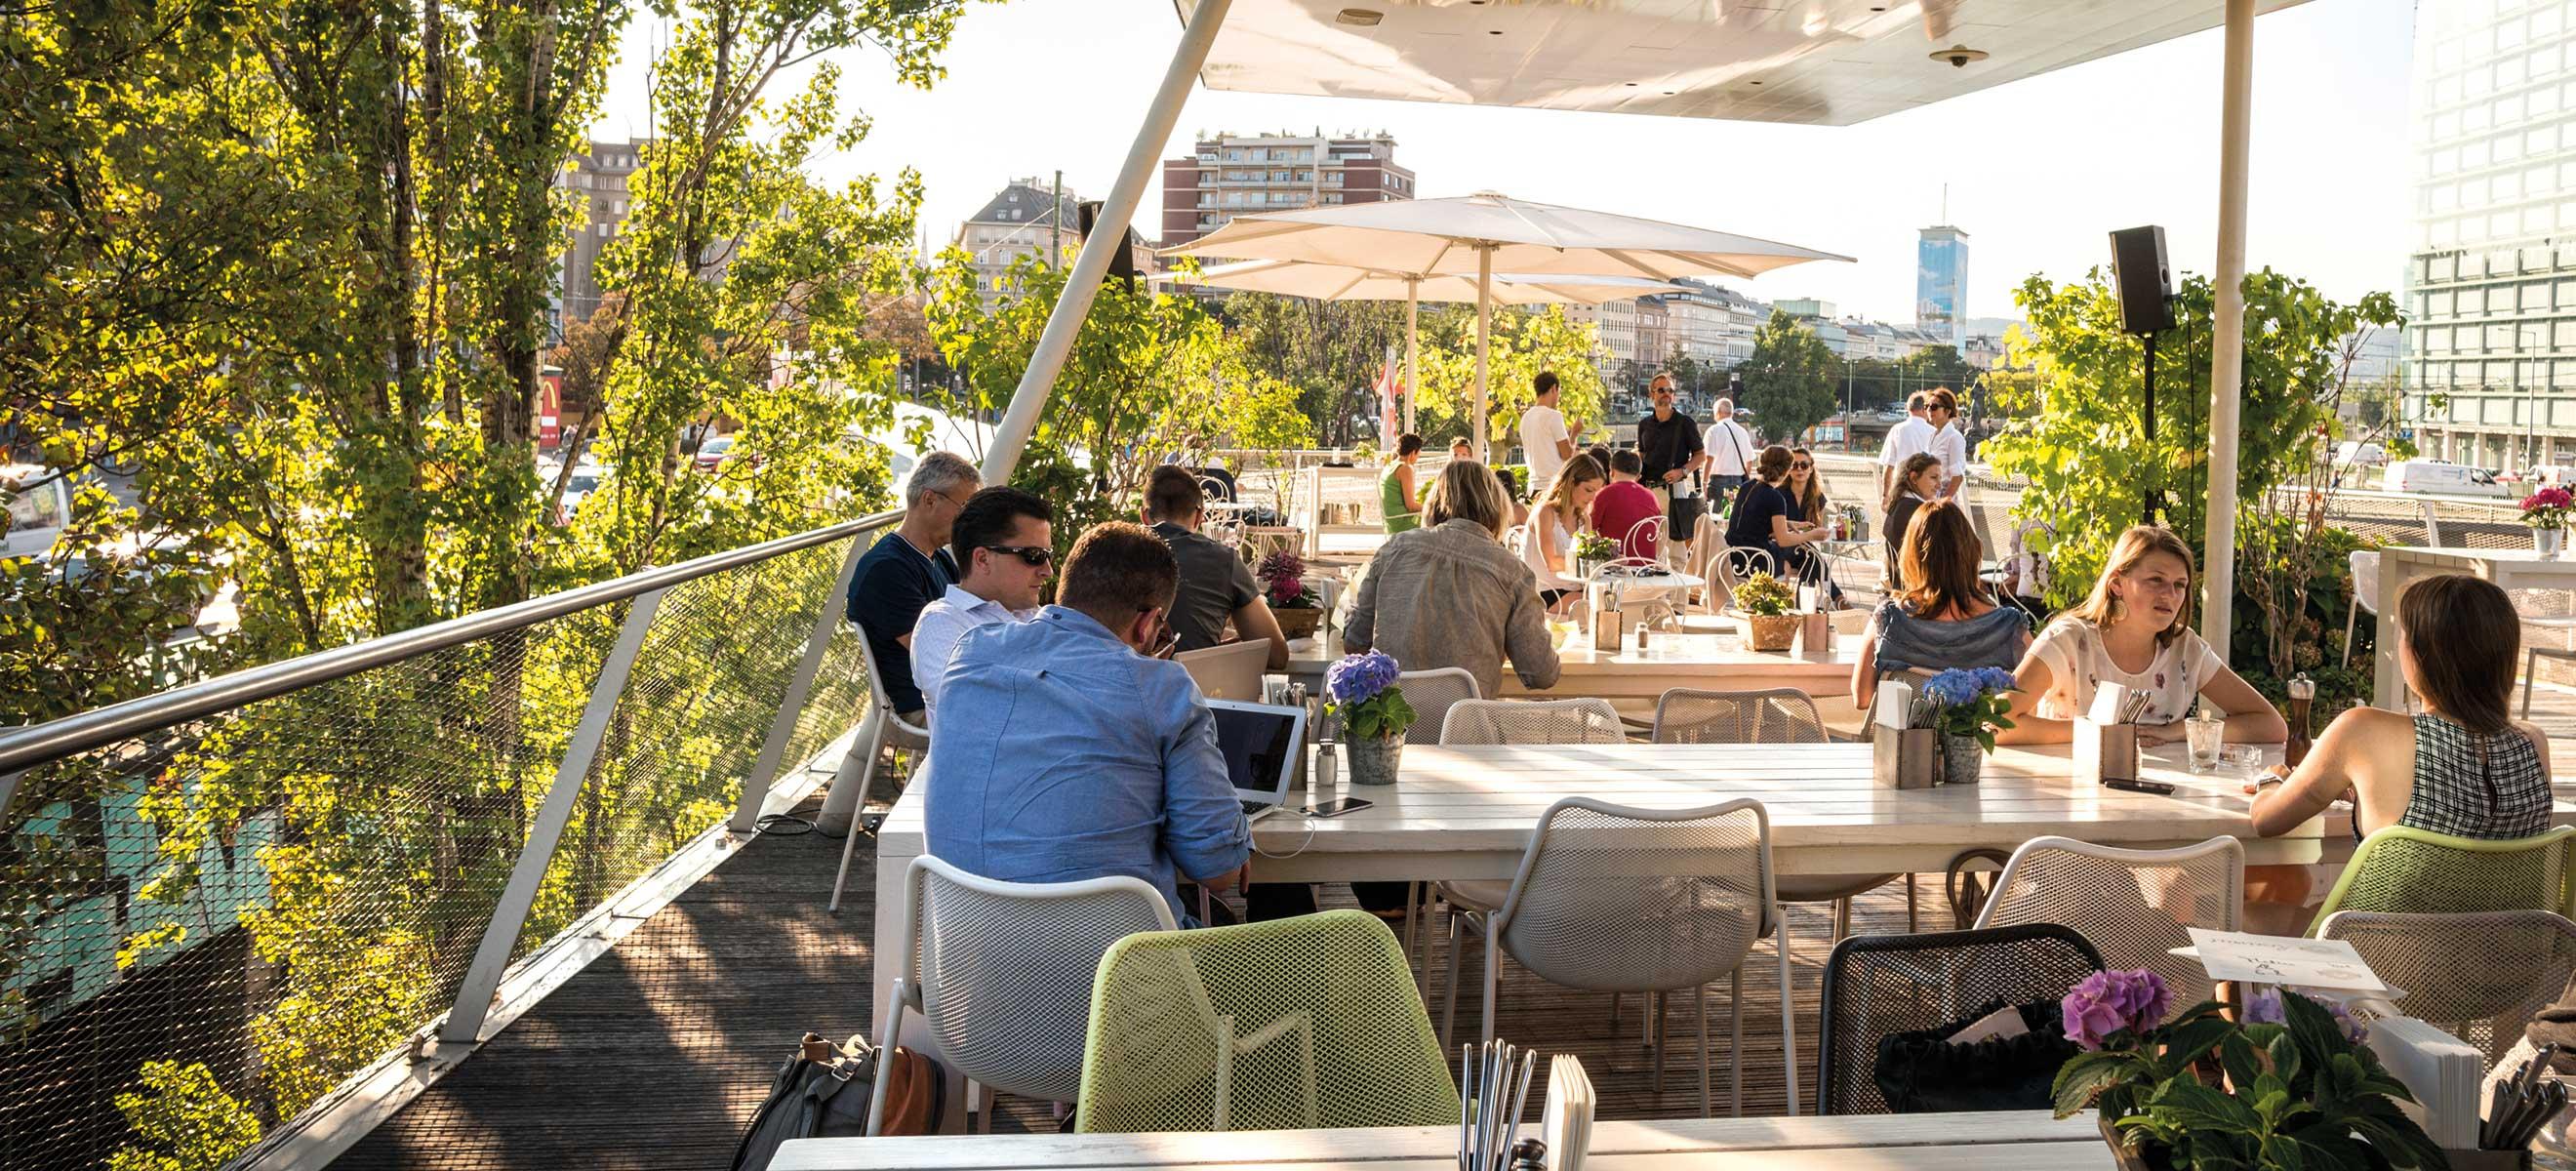 Top 10 Die Besten Rooftop Locations In Wien Falstaff